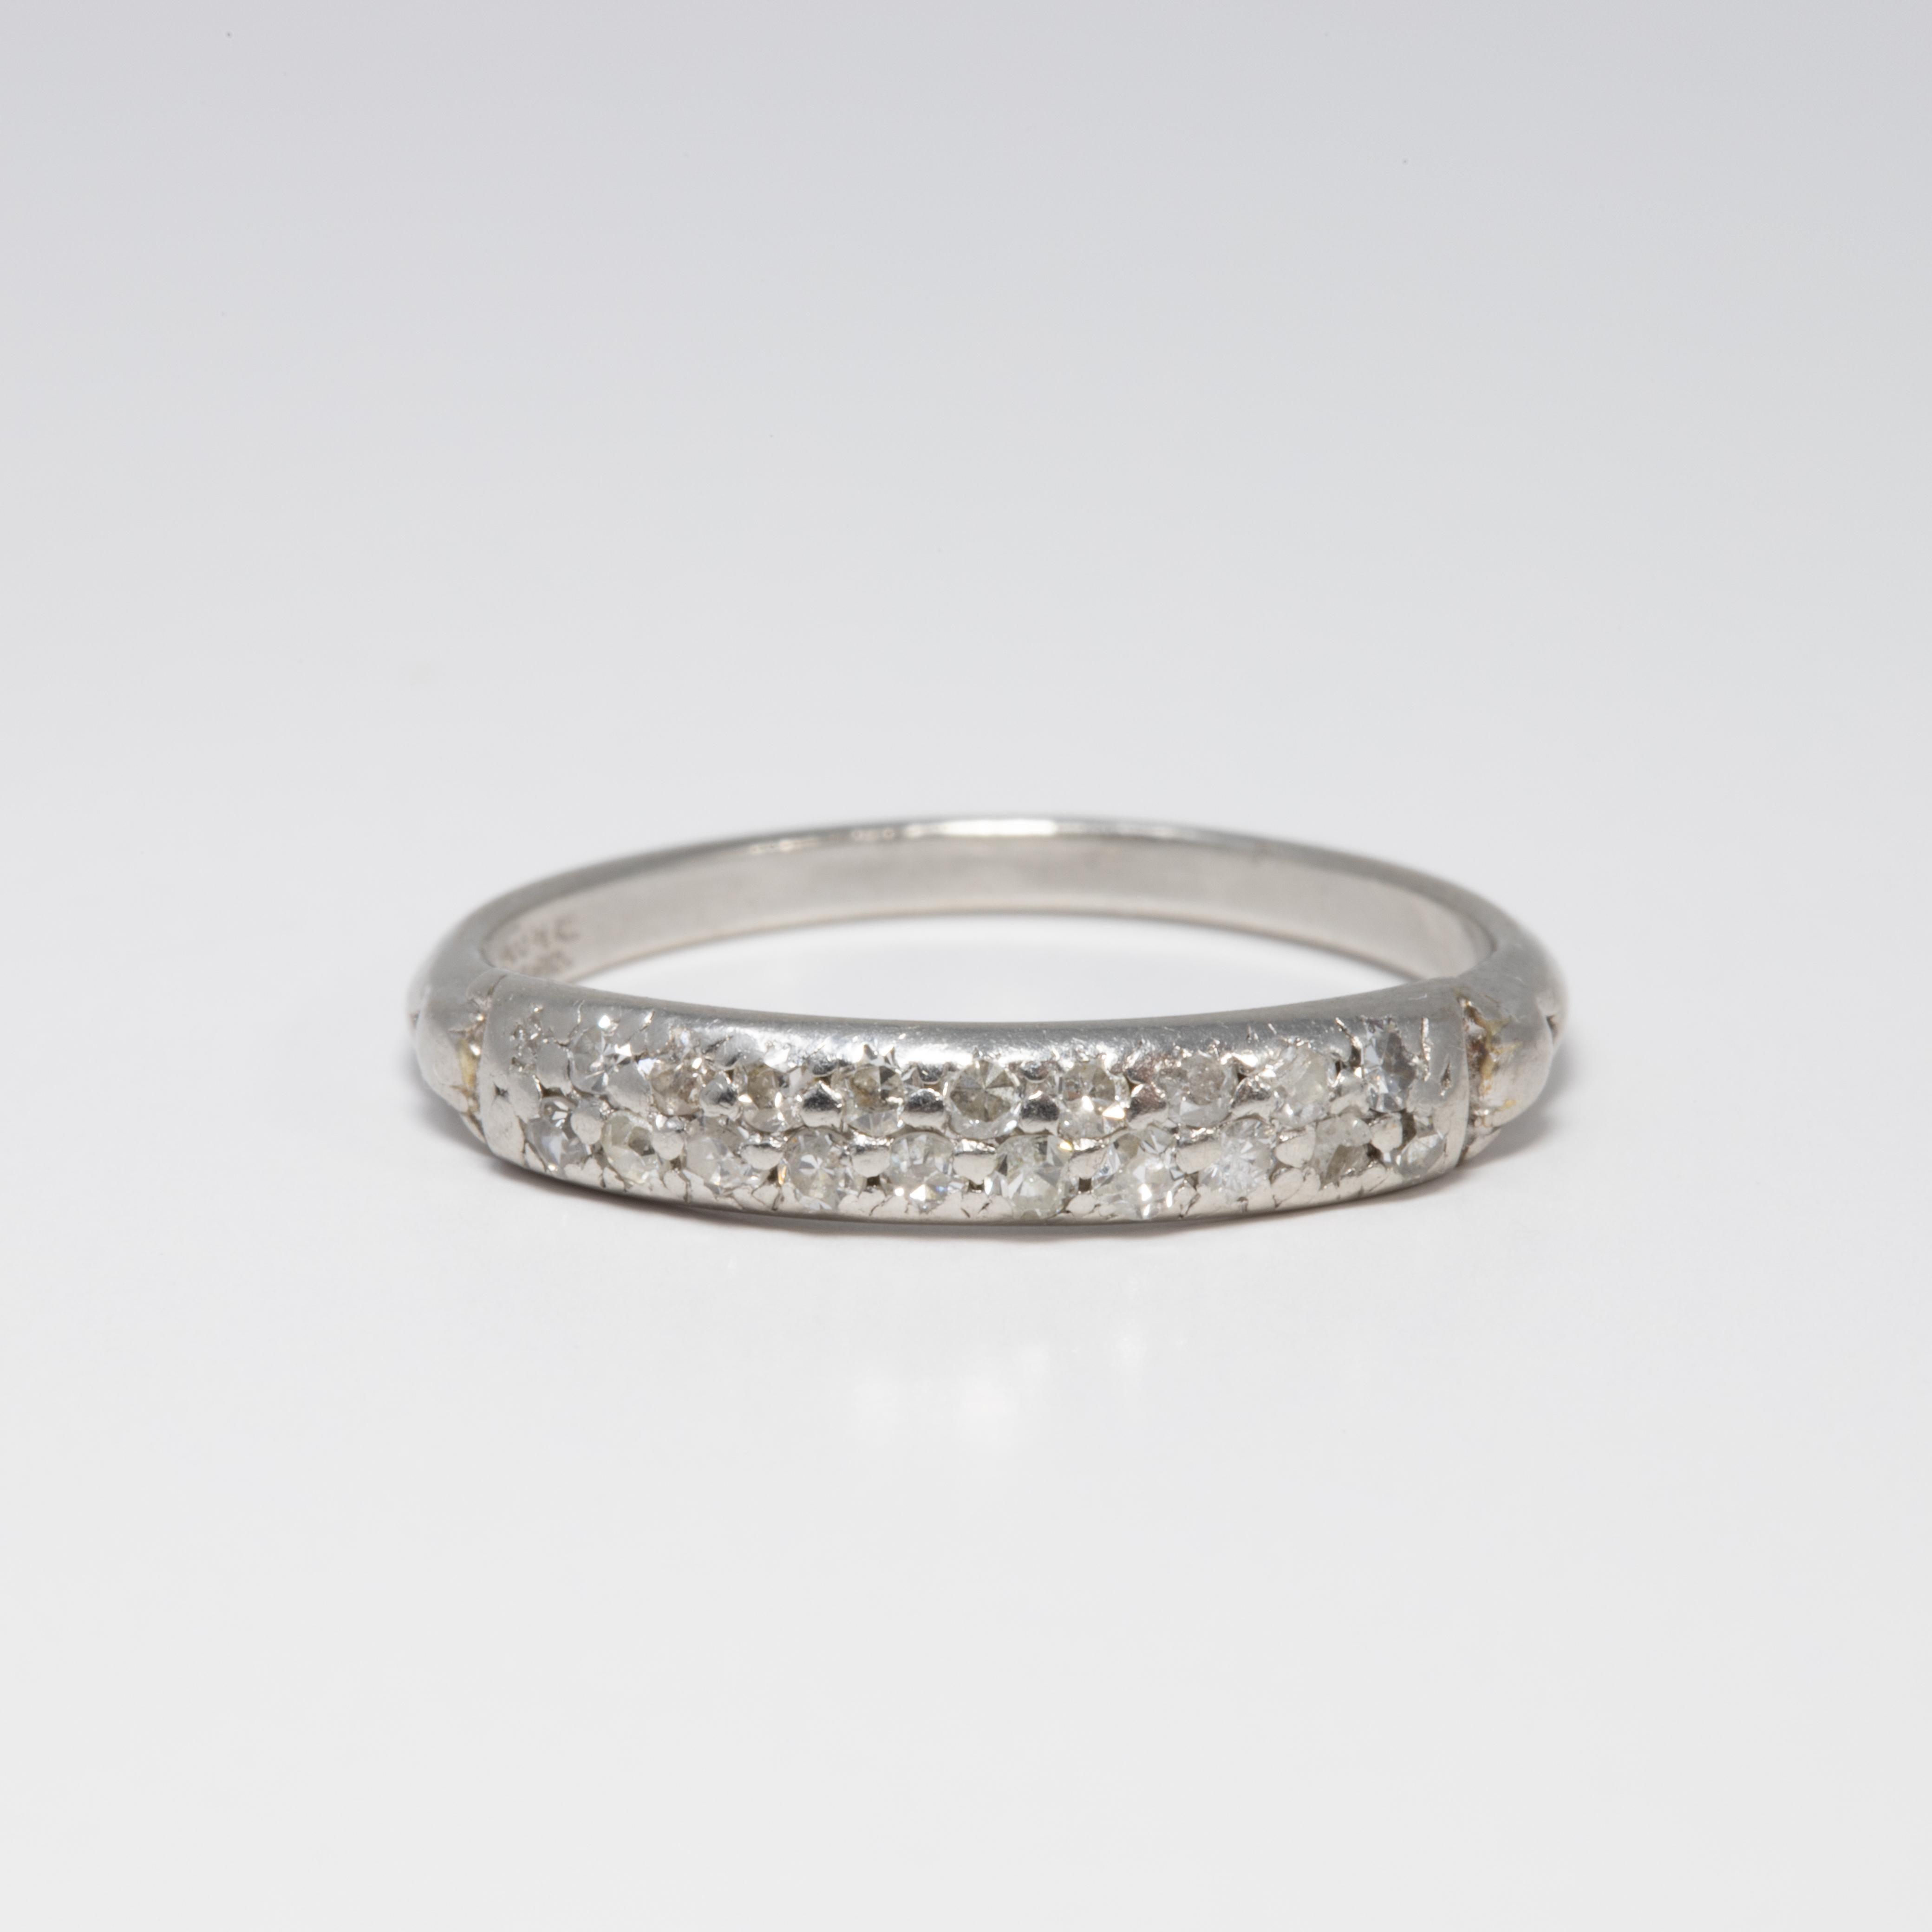 Diamond Platinum Anniversary Style Ring Band 20 Diamonds 2 Carat For Sale At 1stdibs